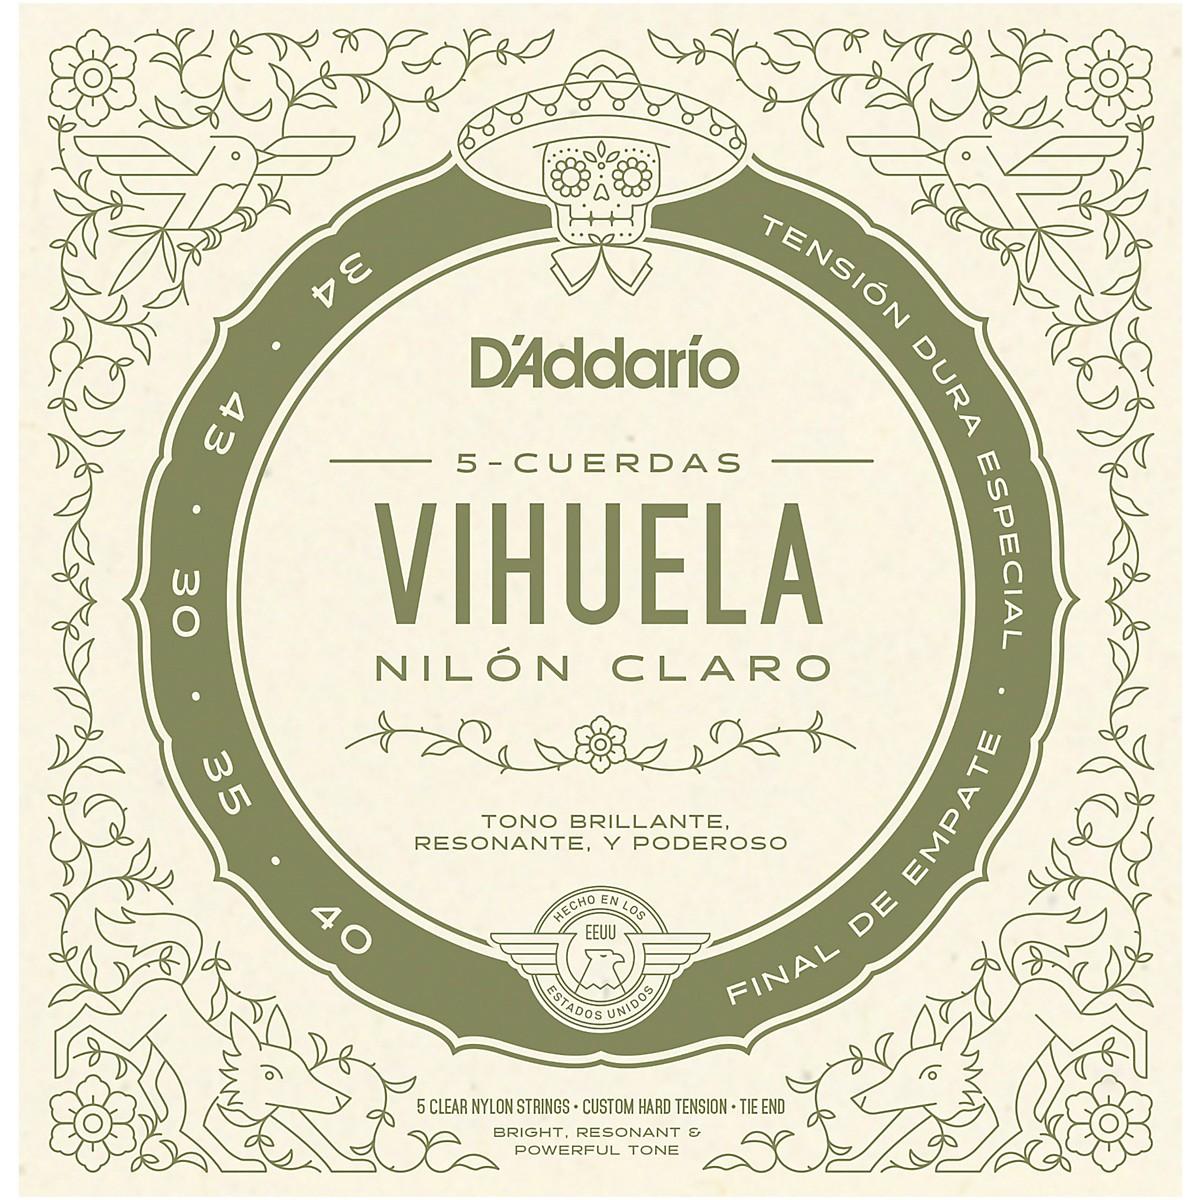 D'Addario Vihuela 5 String Set, Clear Nylon, Custom Hard Tension